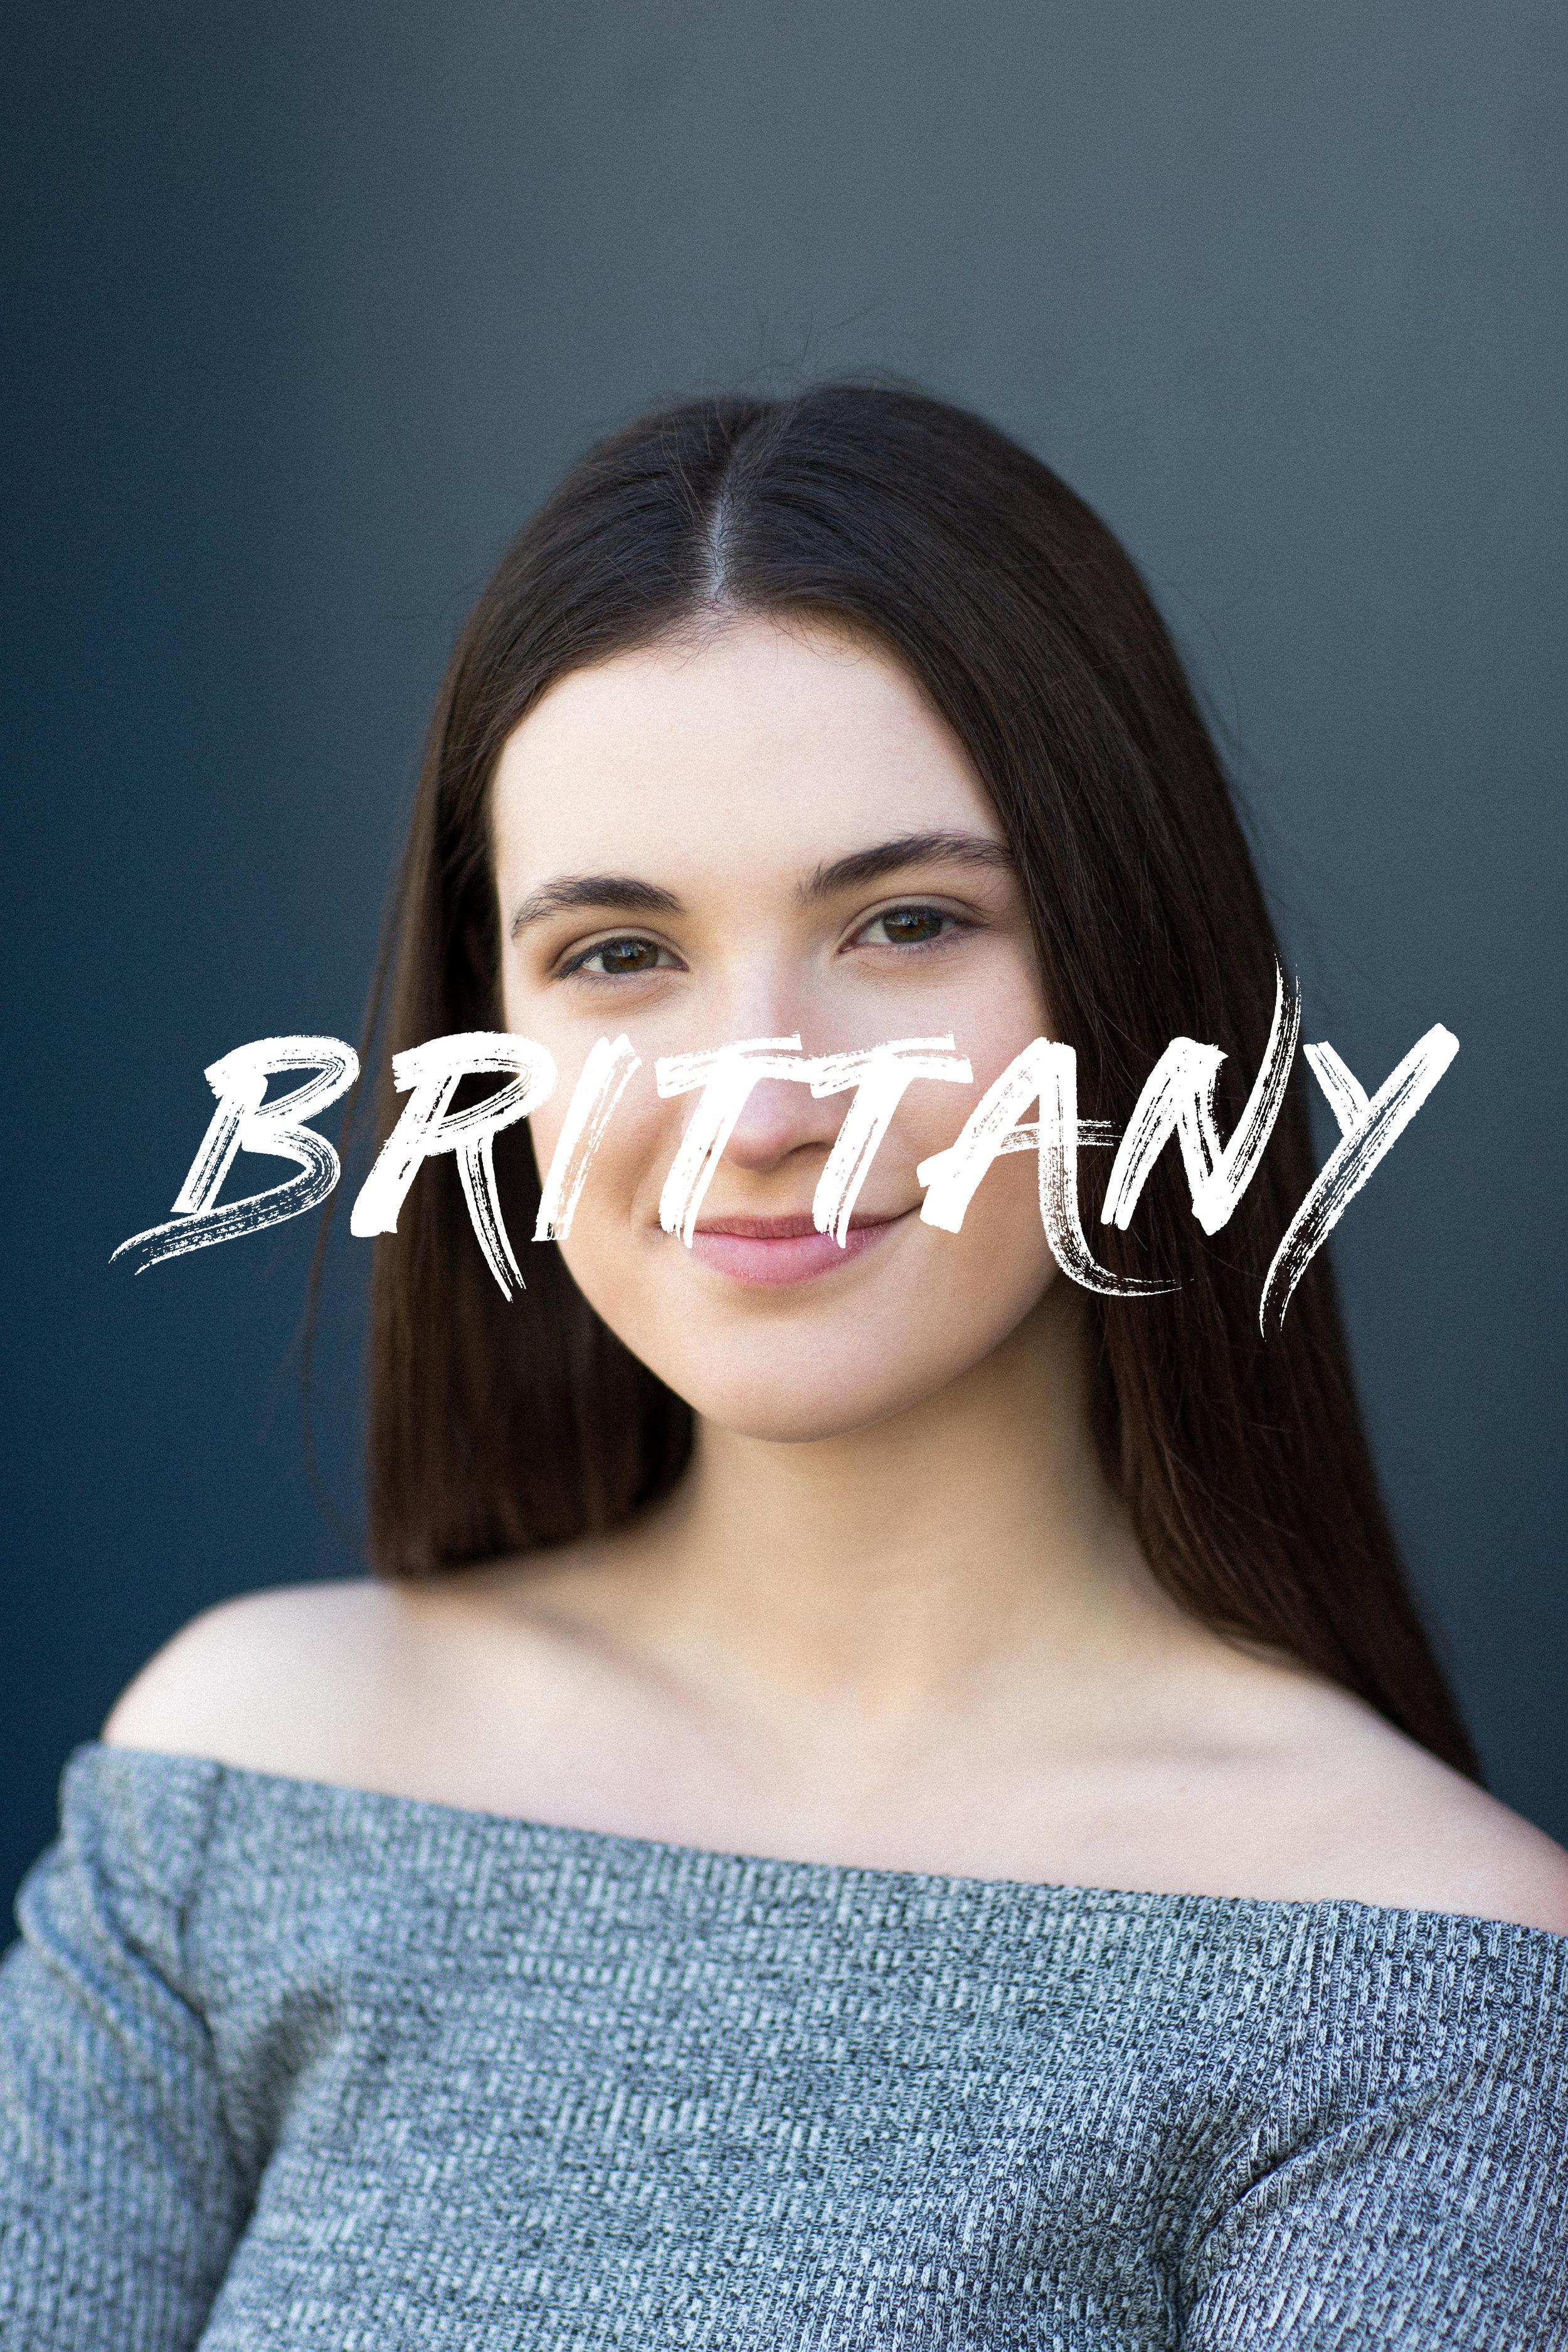 BrittanyThumbnail.jpg